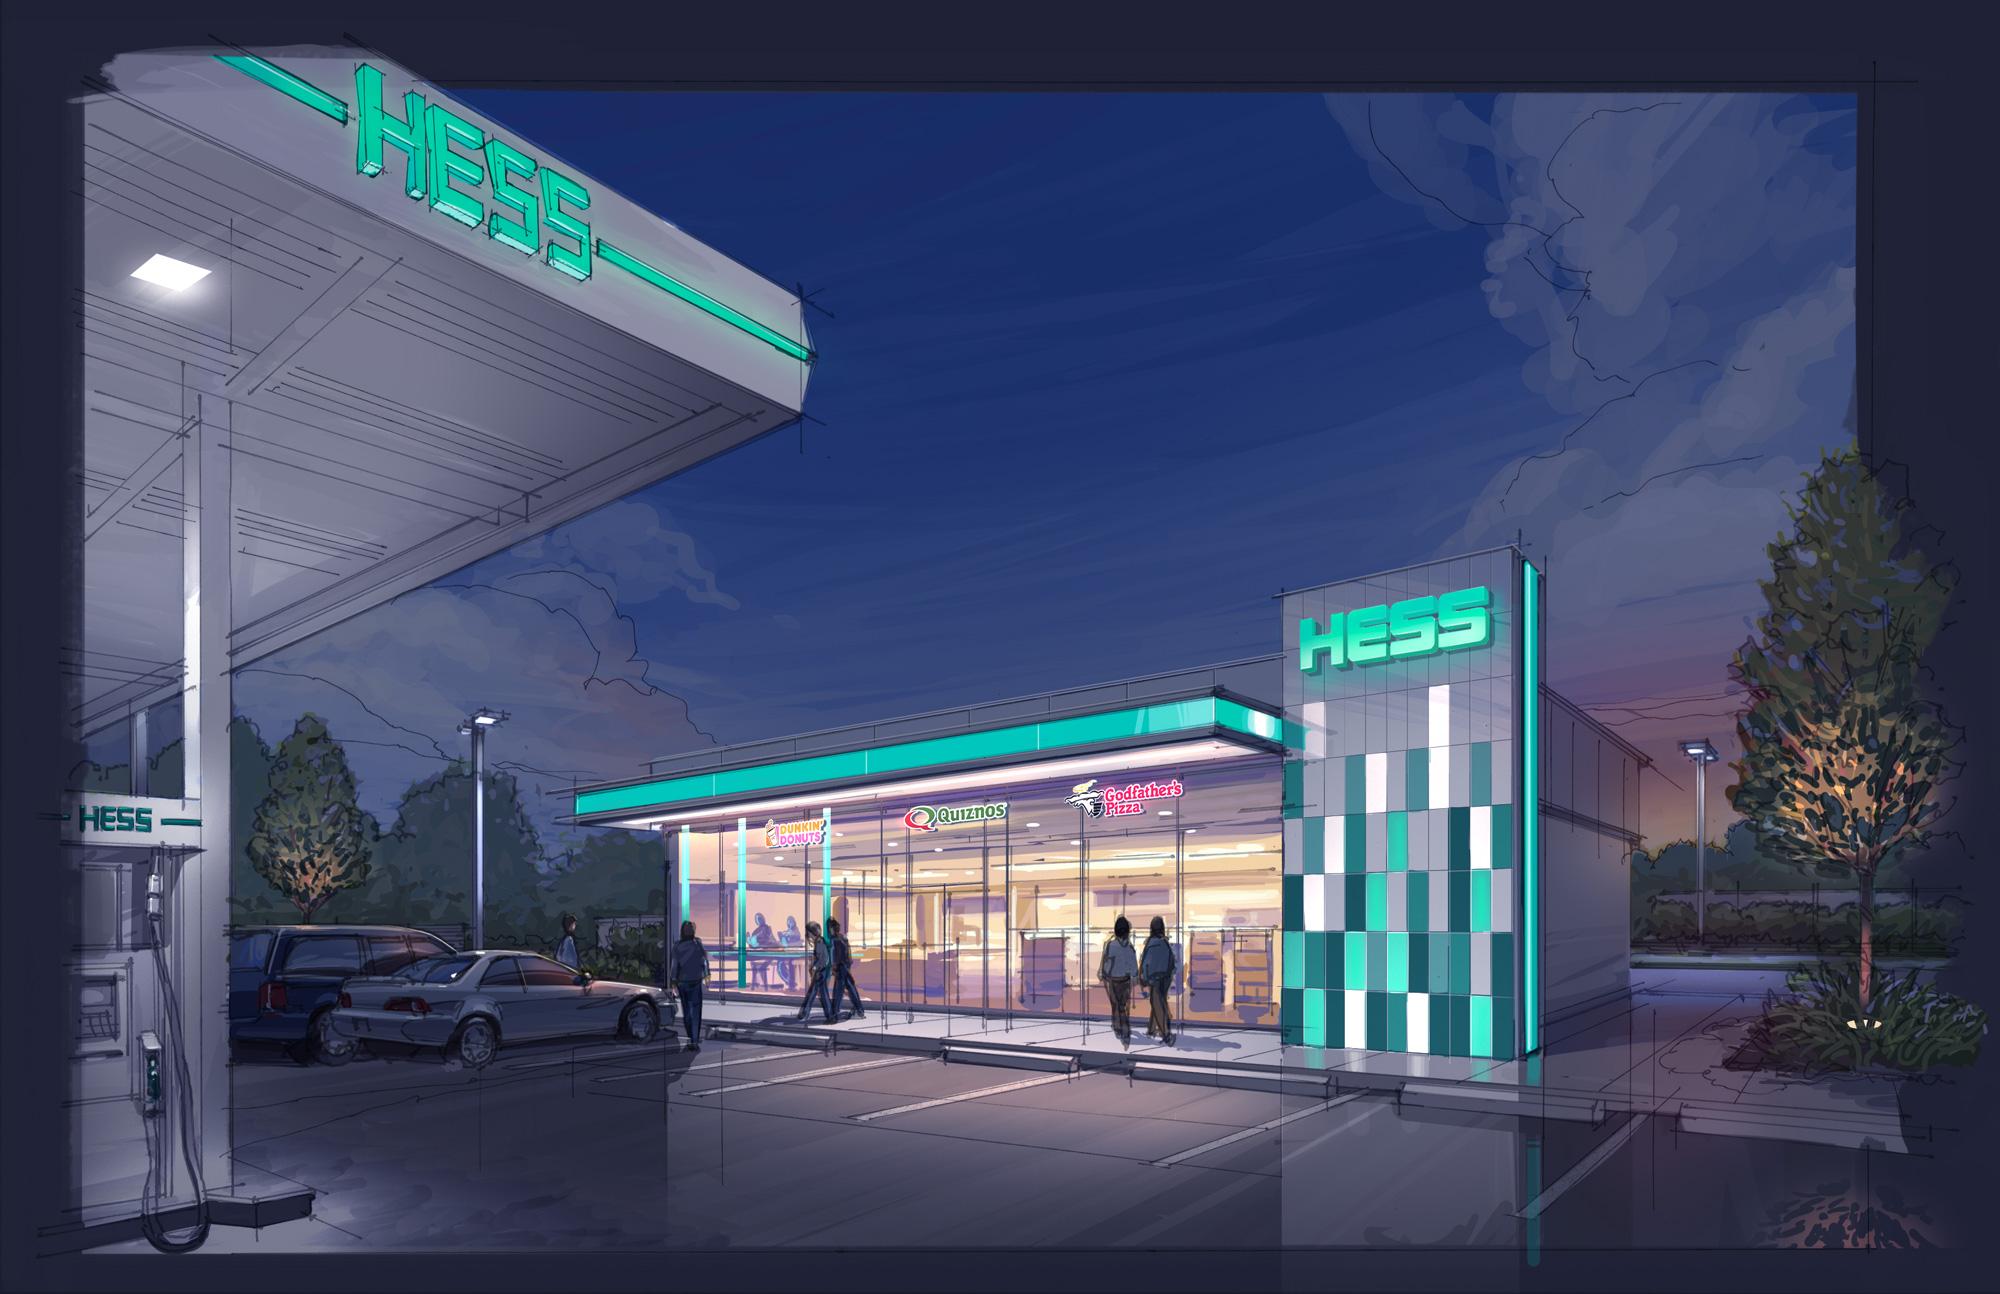 hess  u2013 prototype convenience store architecture  u2013 dave pinter